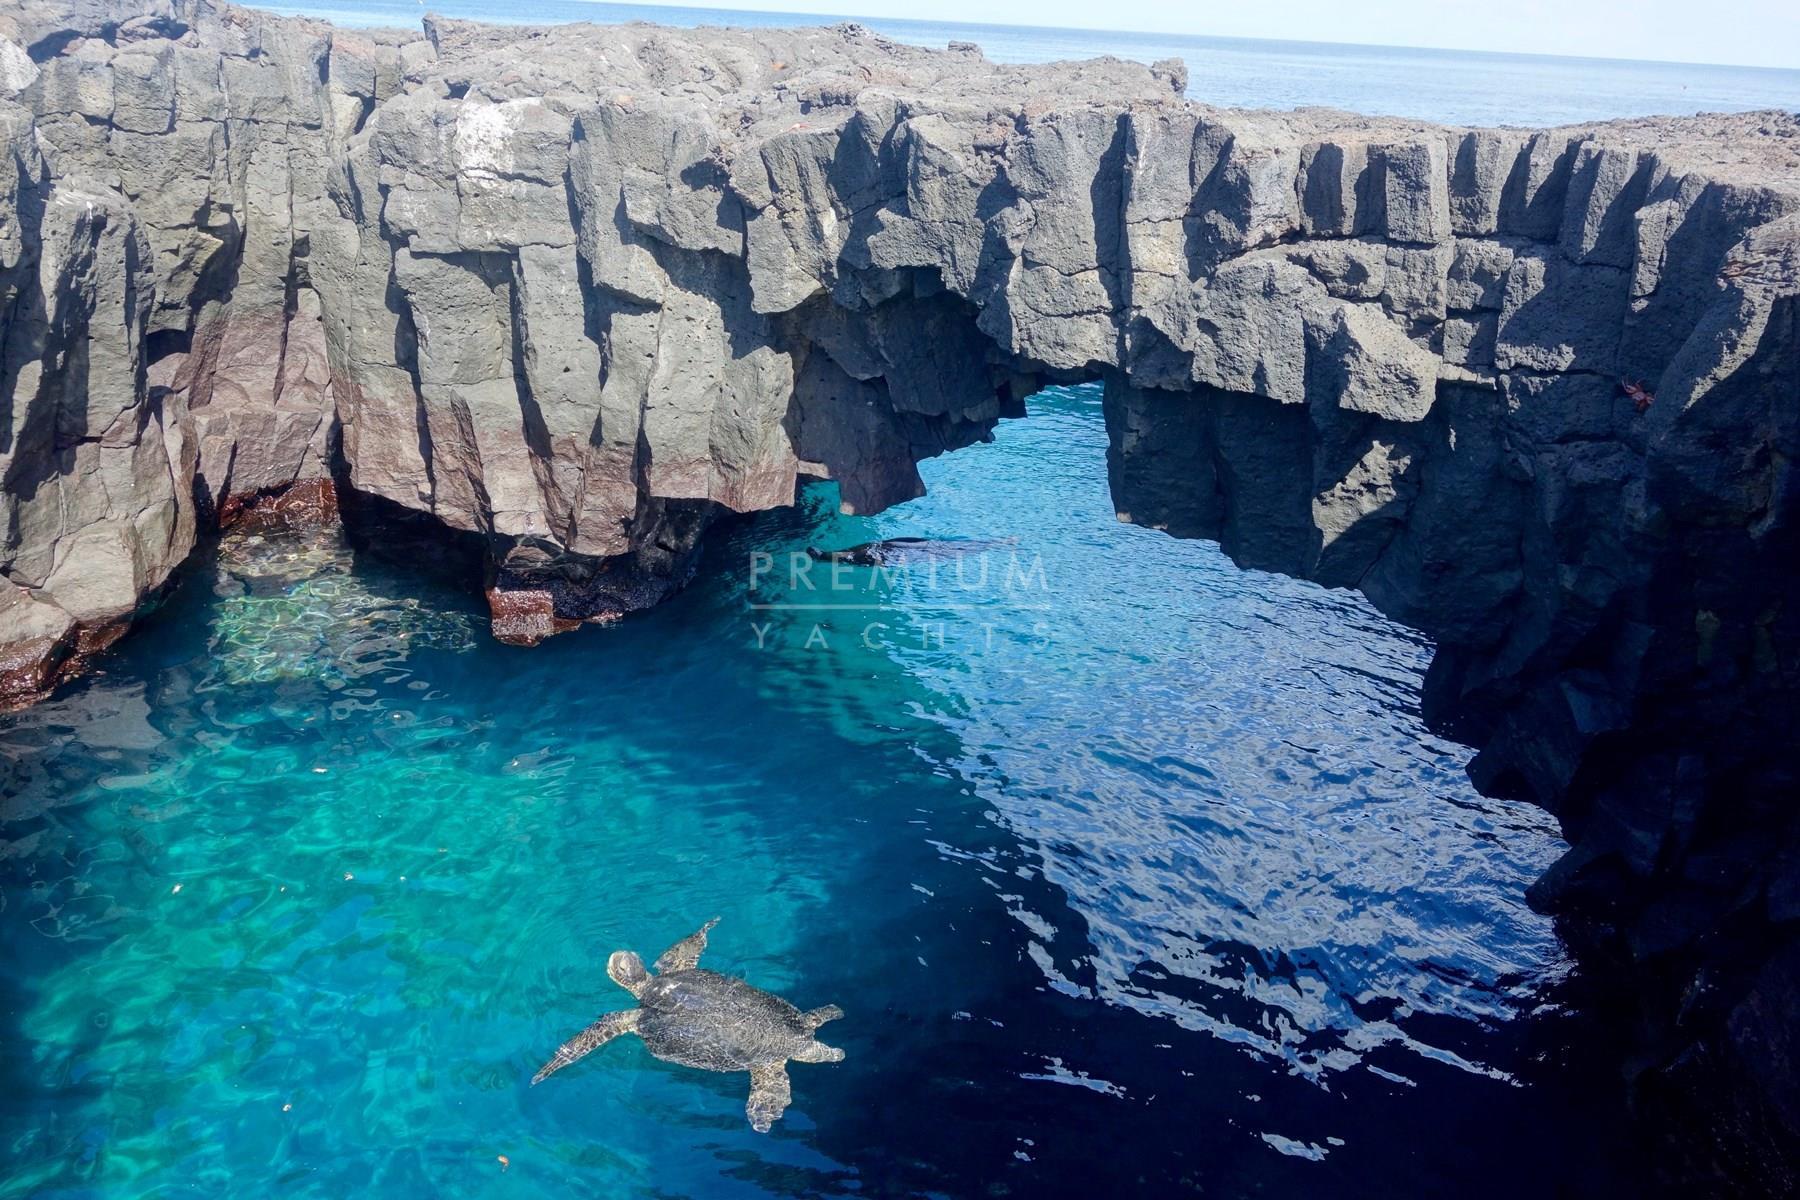 Sea turtles in Santiago island